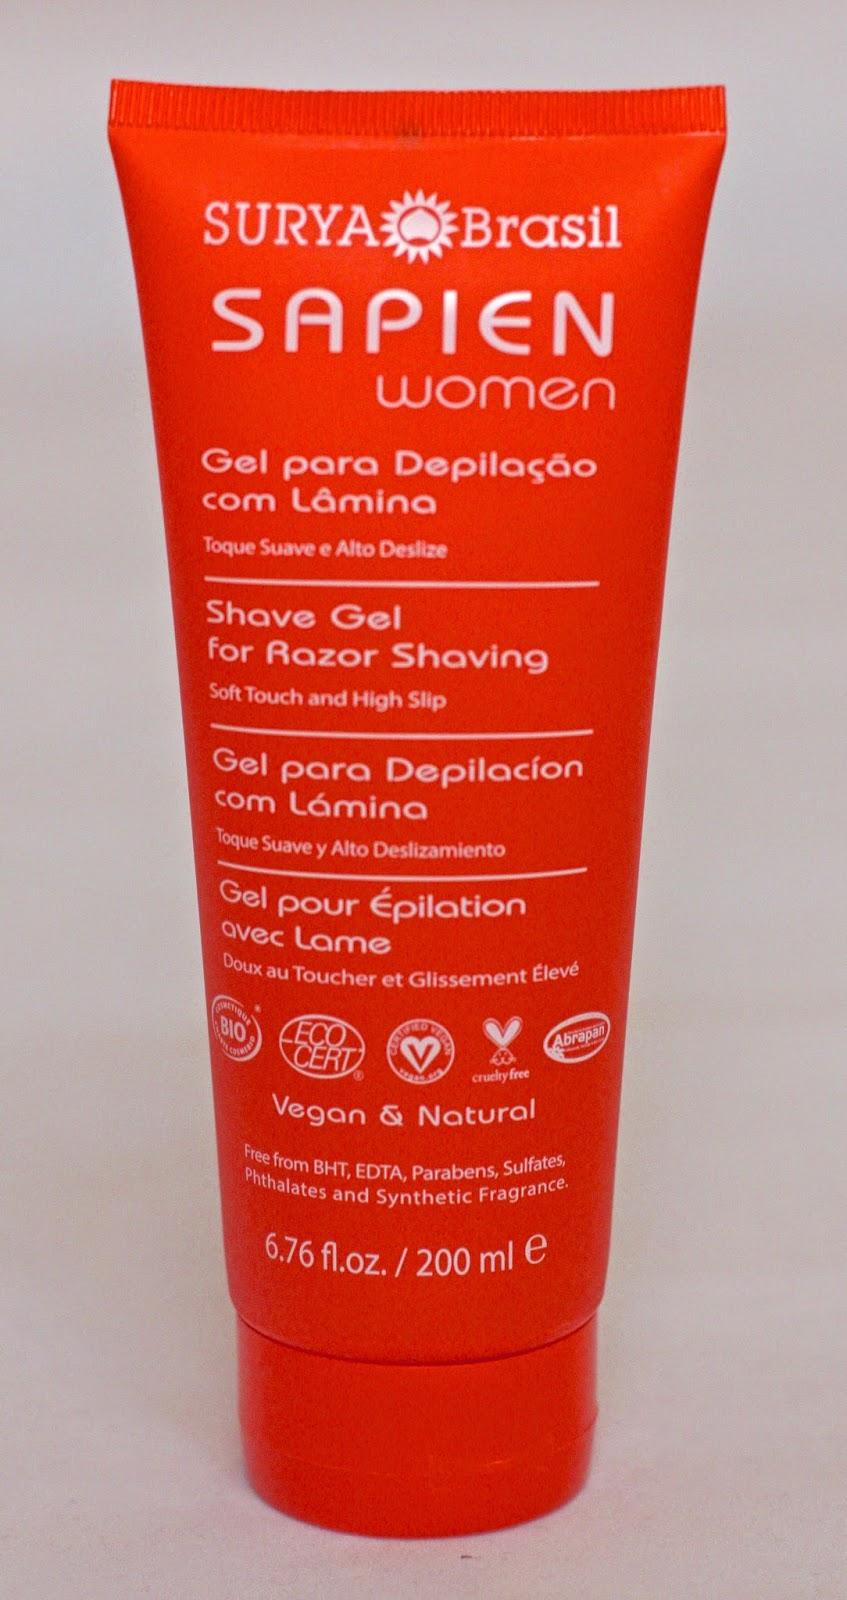 Surya Brasil SAPIEN Women Shave Gel